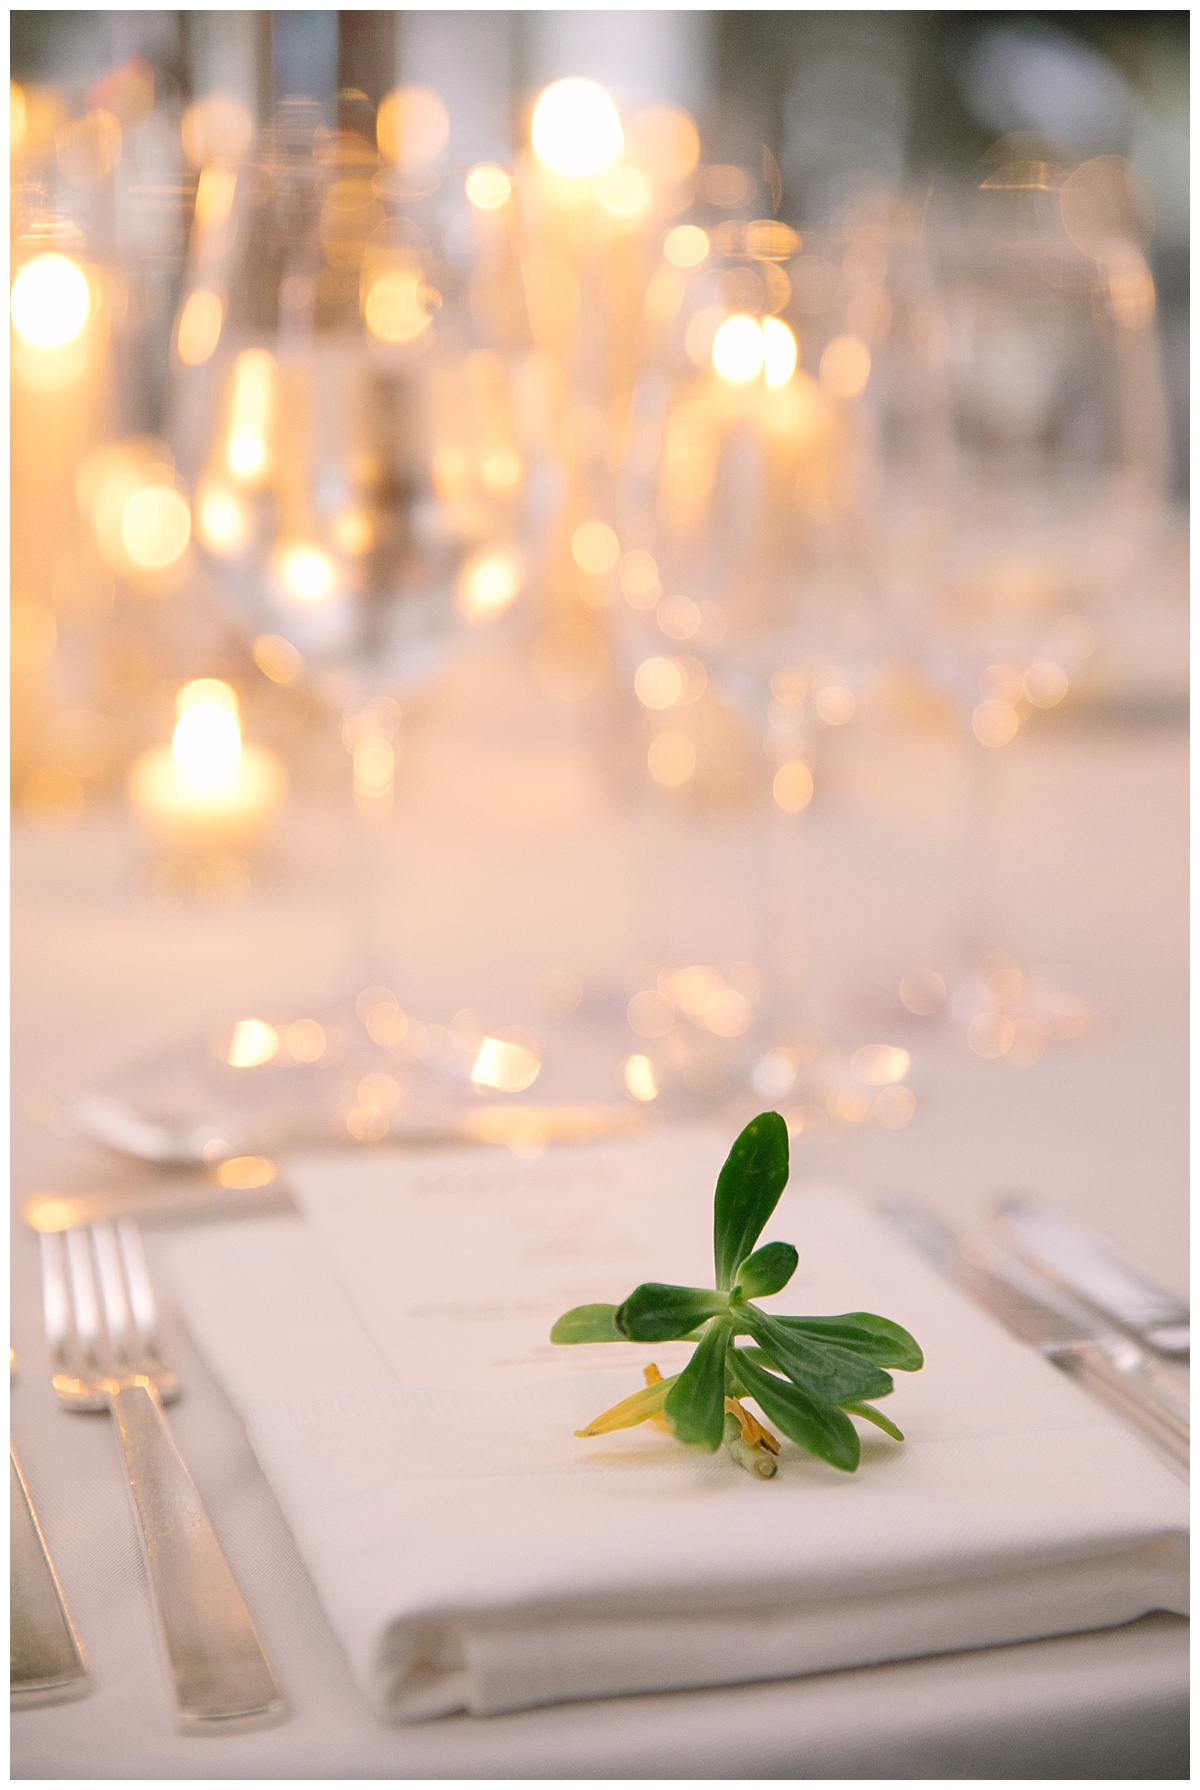 guastavinos-wedding-susan-shek-photography_0111.jpg